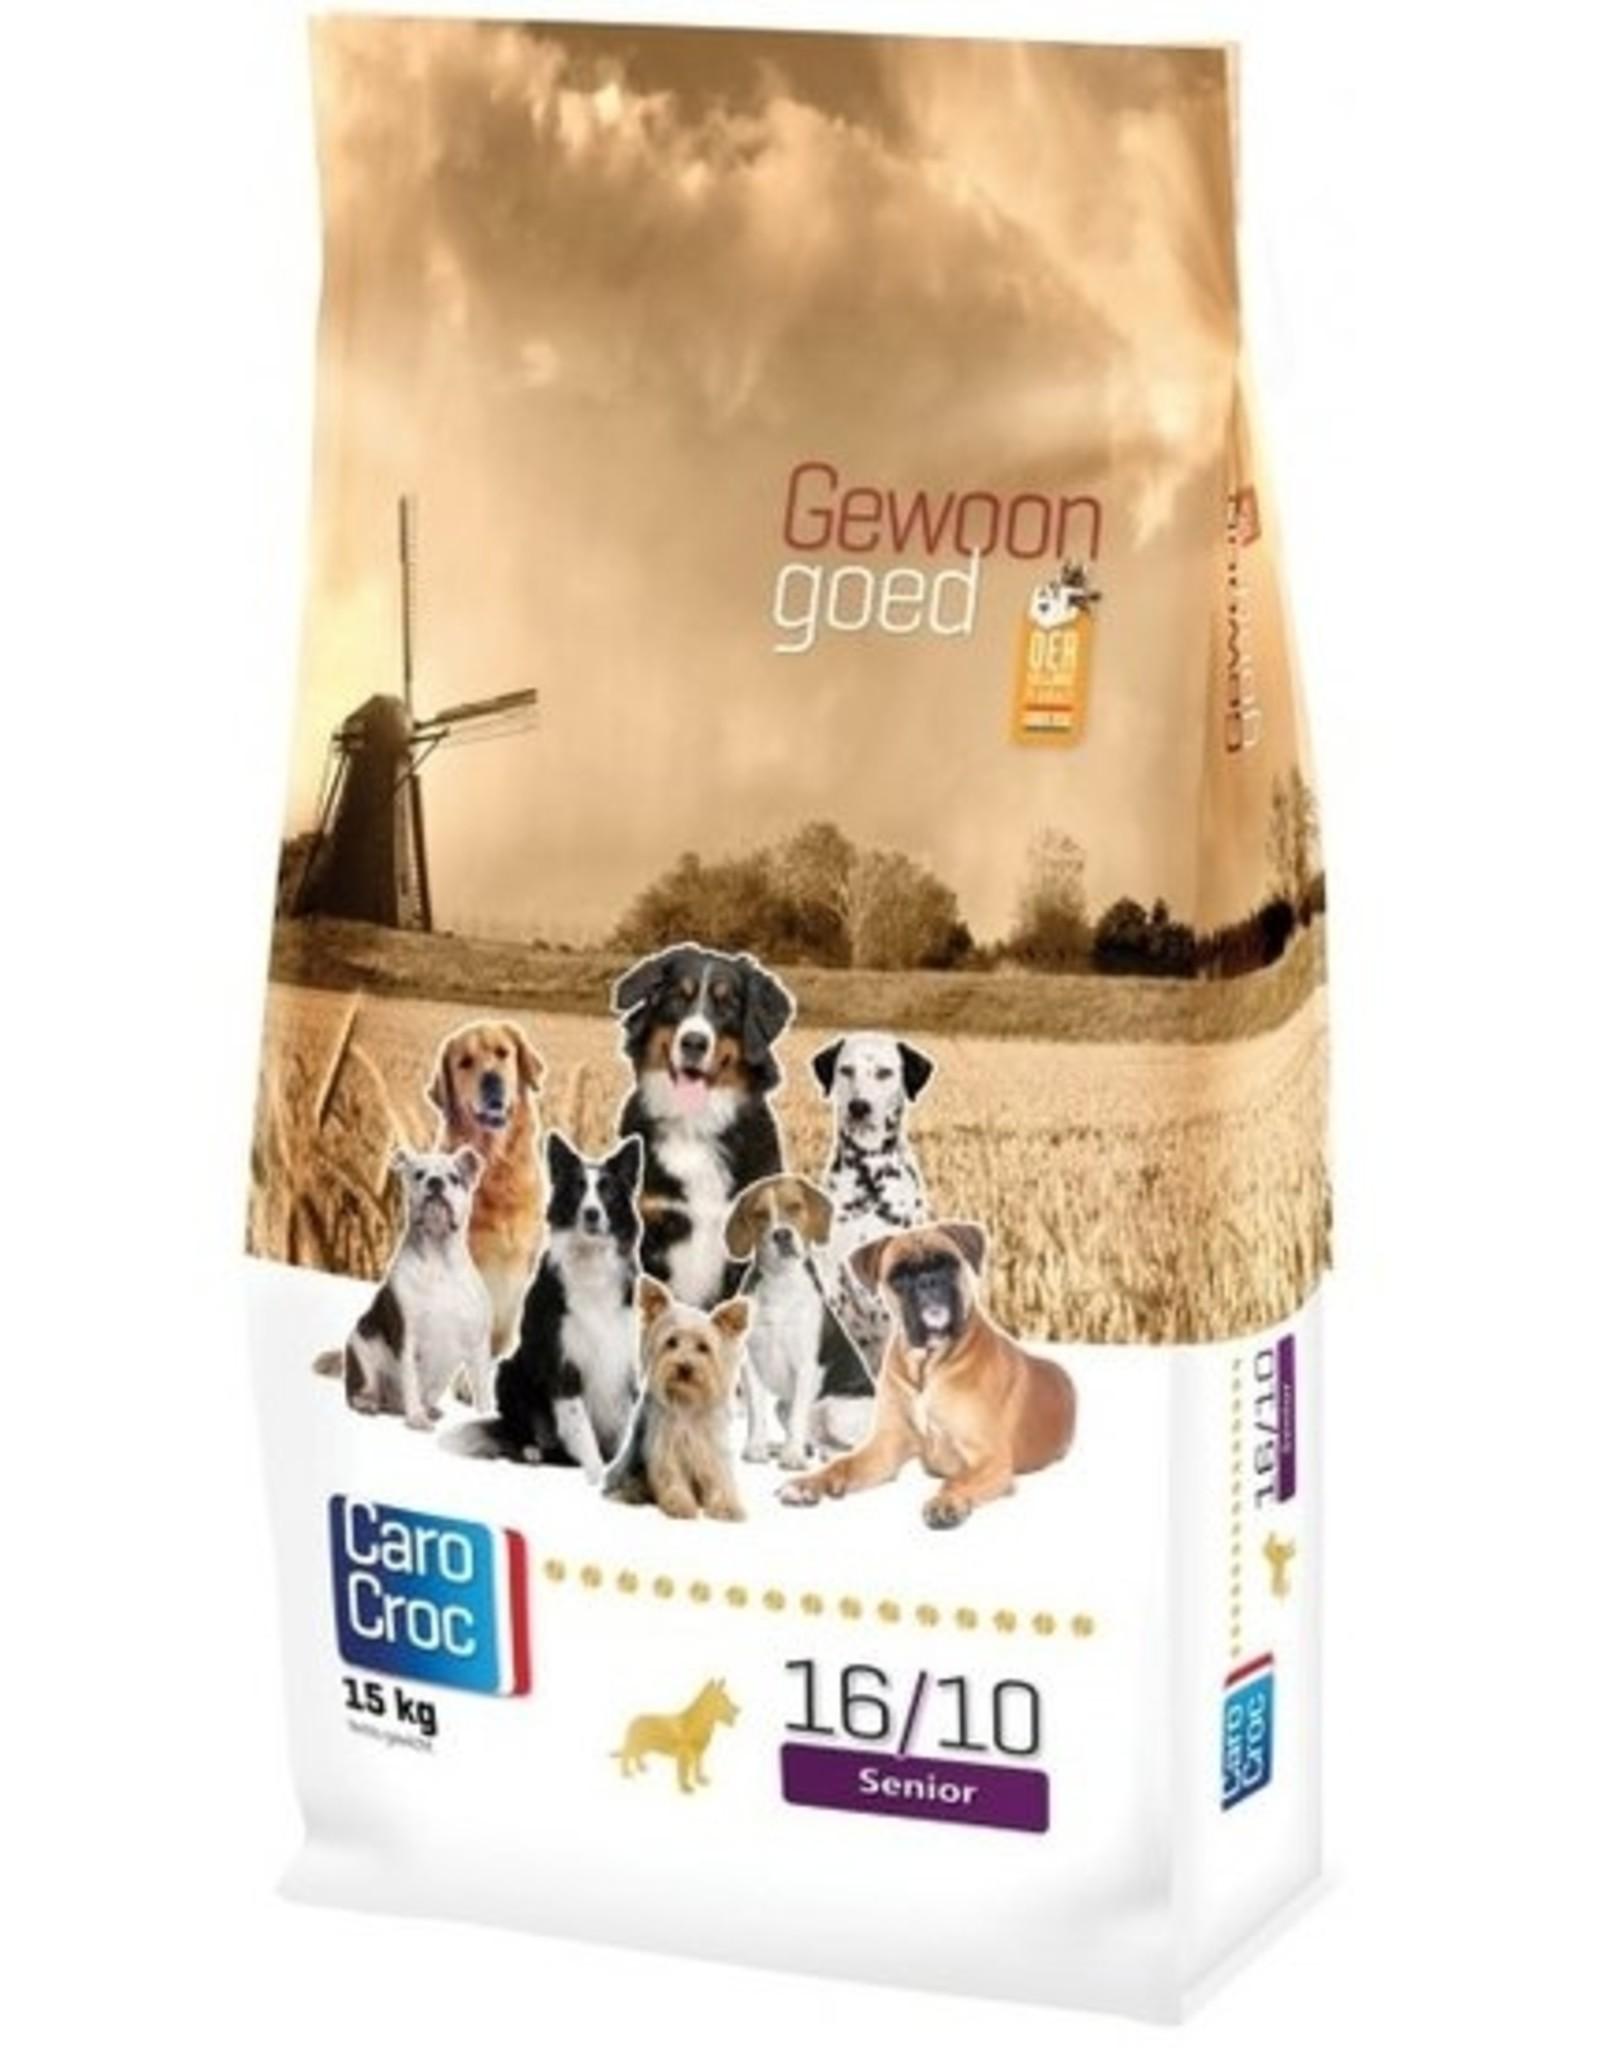 Sanimed Sanimed Carocroc Senior Canine 16/10 Lamb 3kg